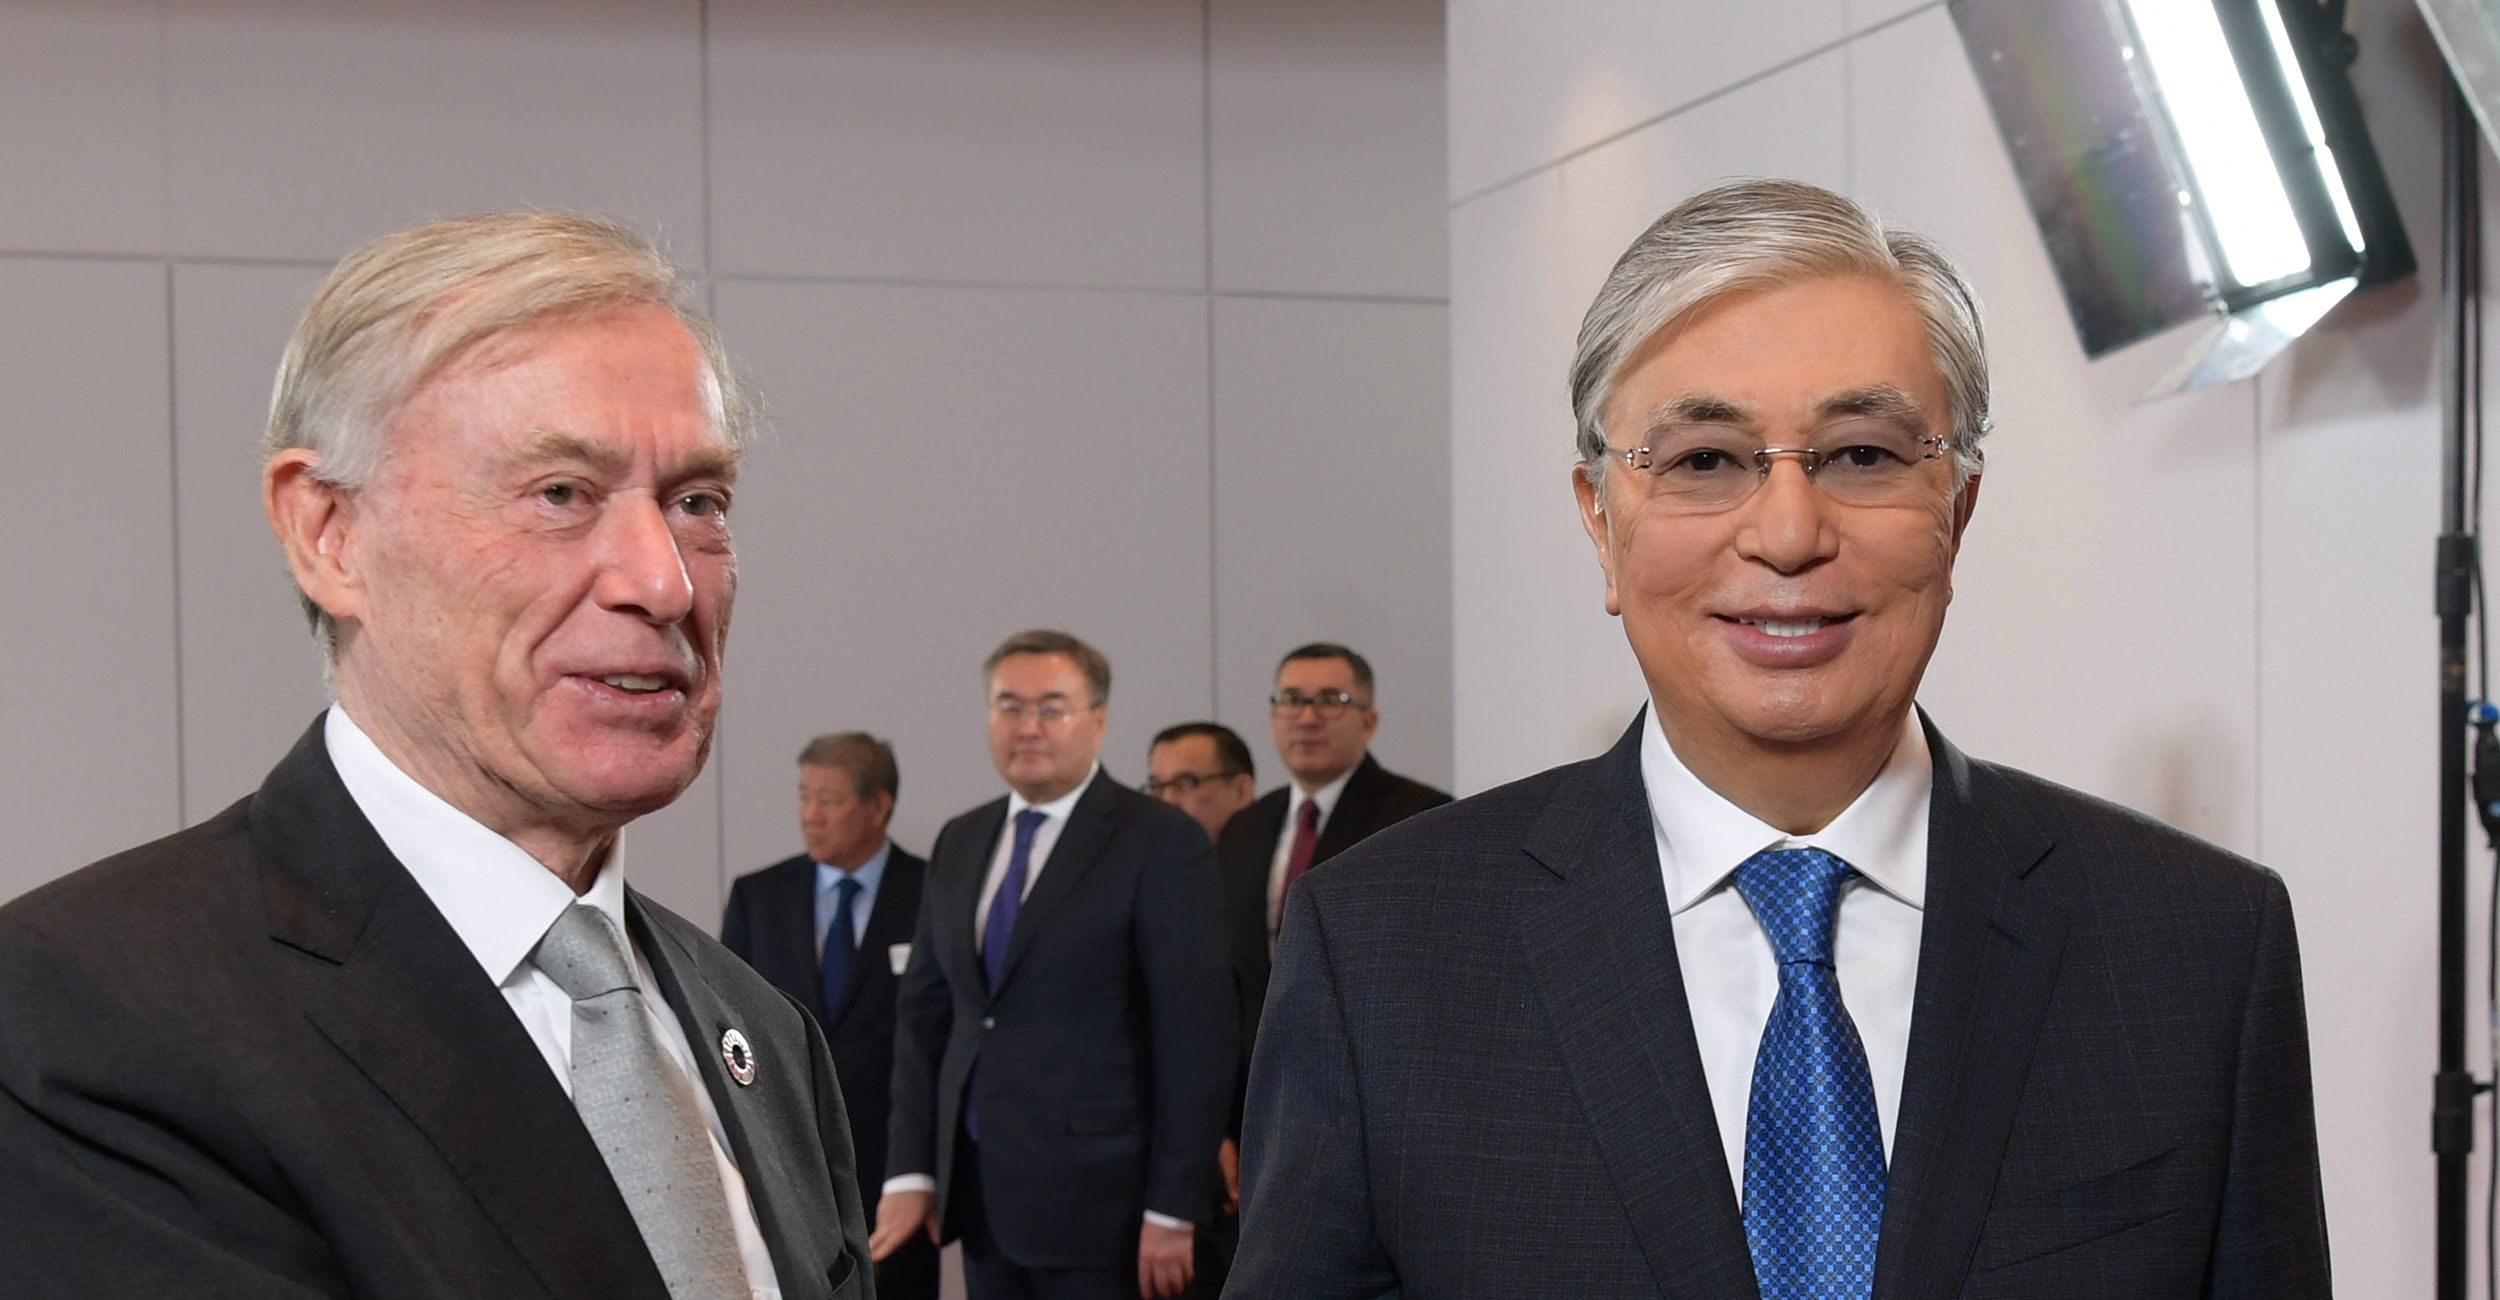 Kassym-Jomart Tokayev met with former German President Horst Köhler